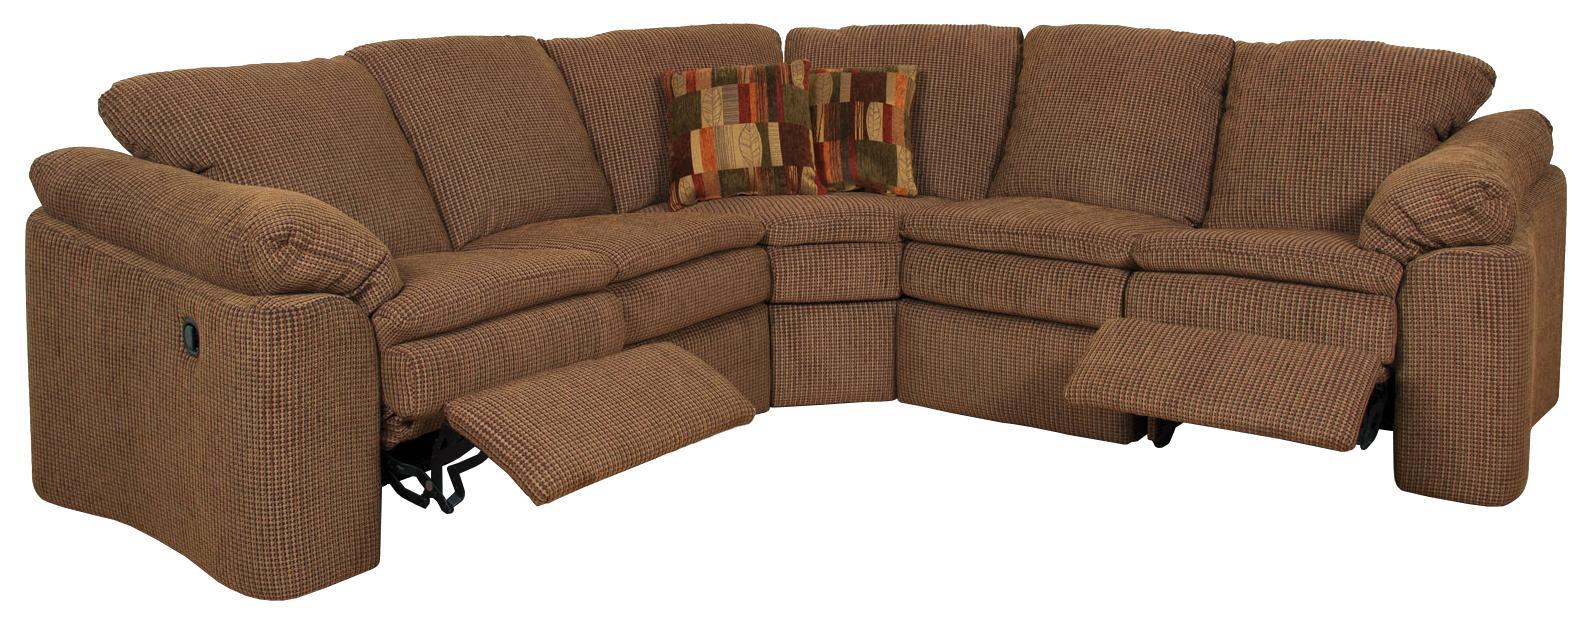 England Seneca Falls Sectional Sofa - Item Number: 7300-58+54+22+39+57